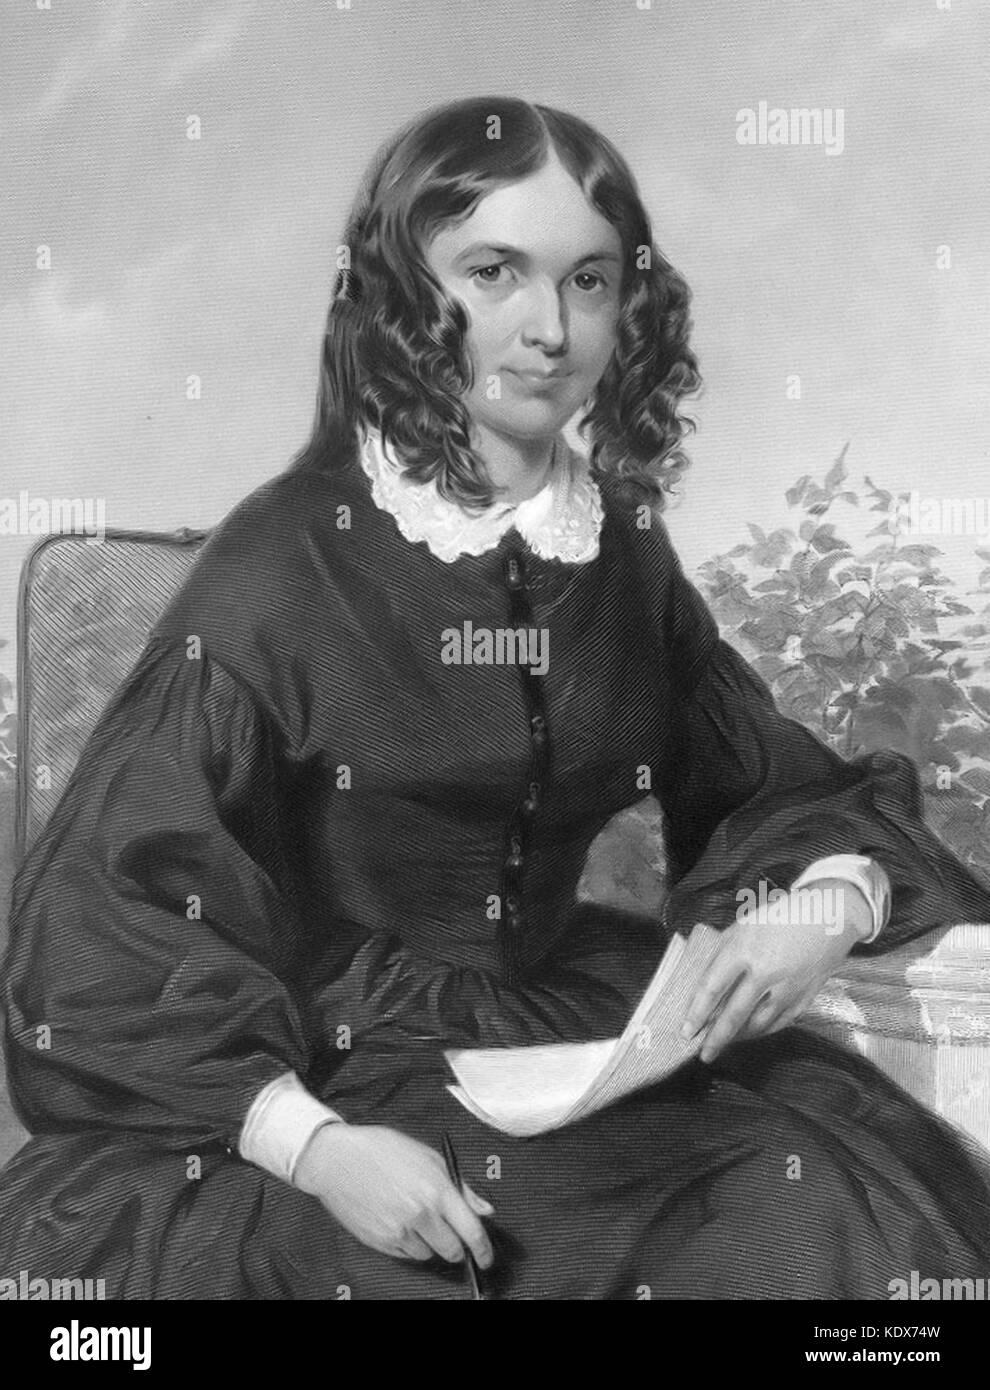 Elizabeth Barrett Browning, English poet of the Victorian era - Stock Image